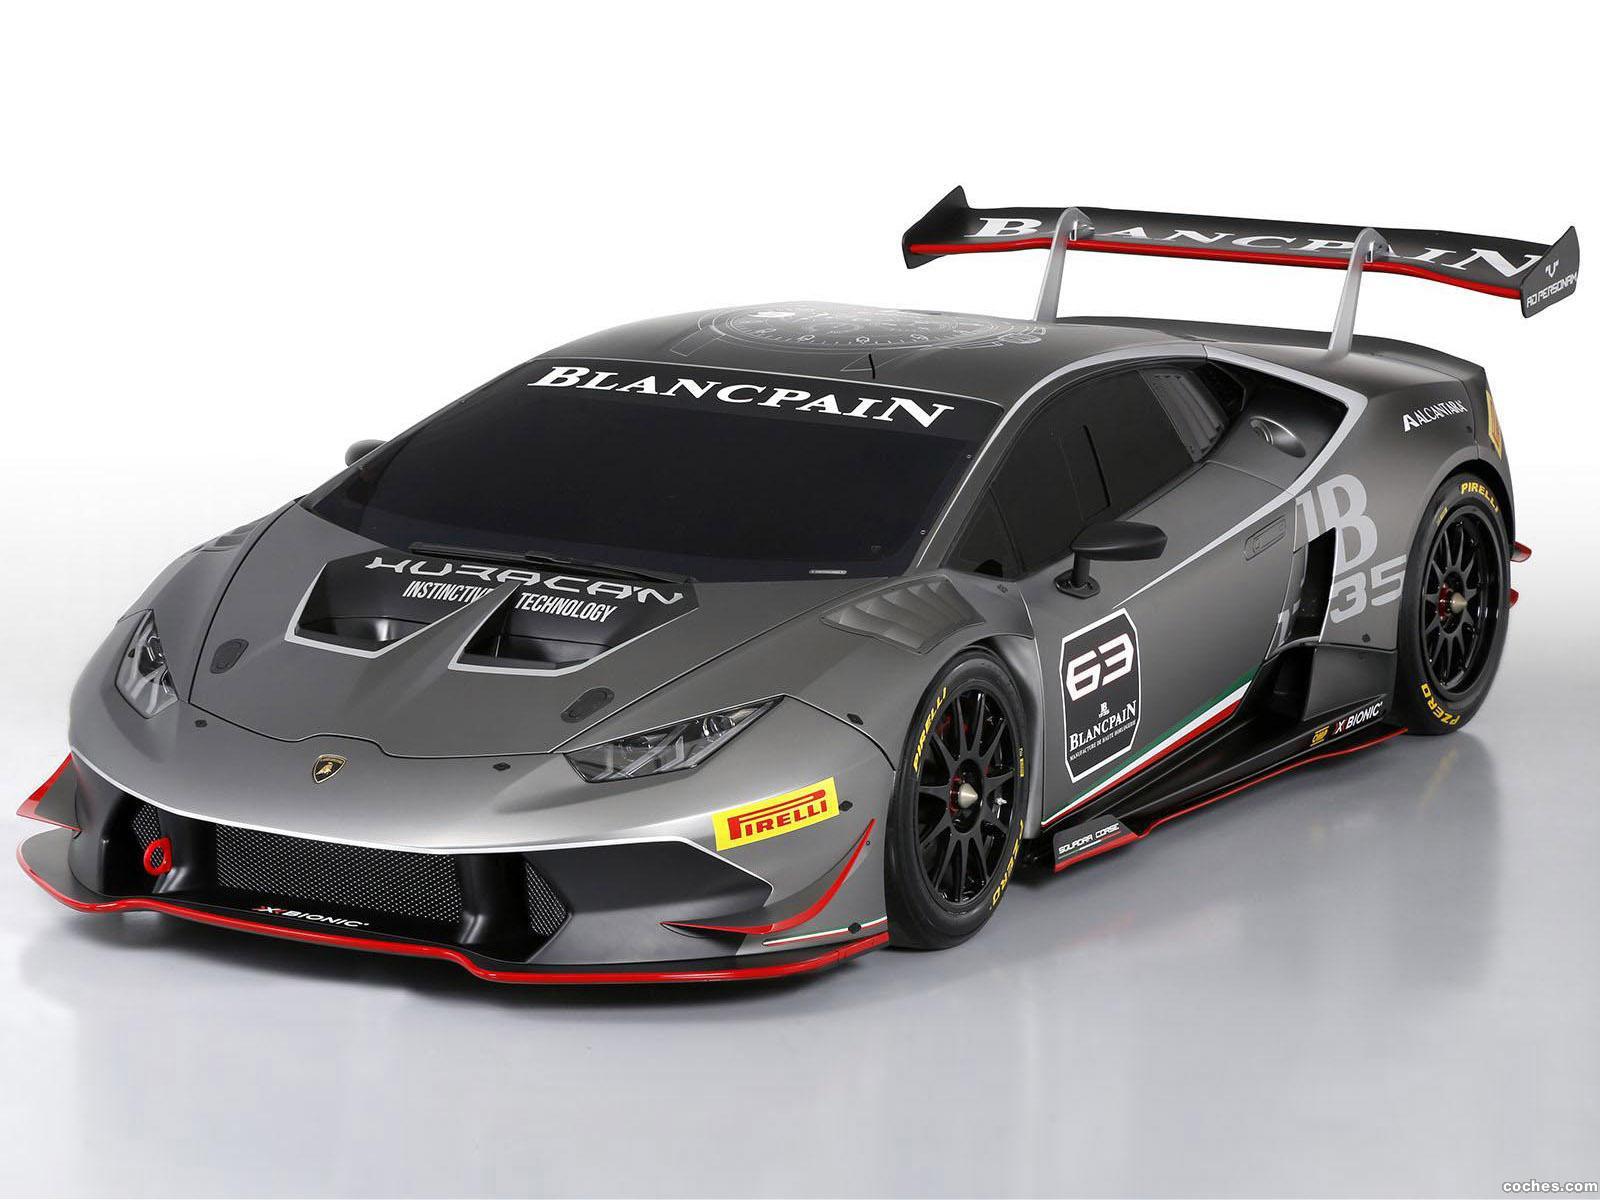 Foto 0 de Lamborghini Huracan LP620-2 Super Trofeo 2014